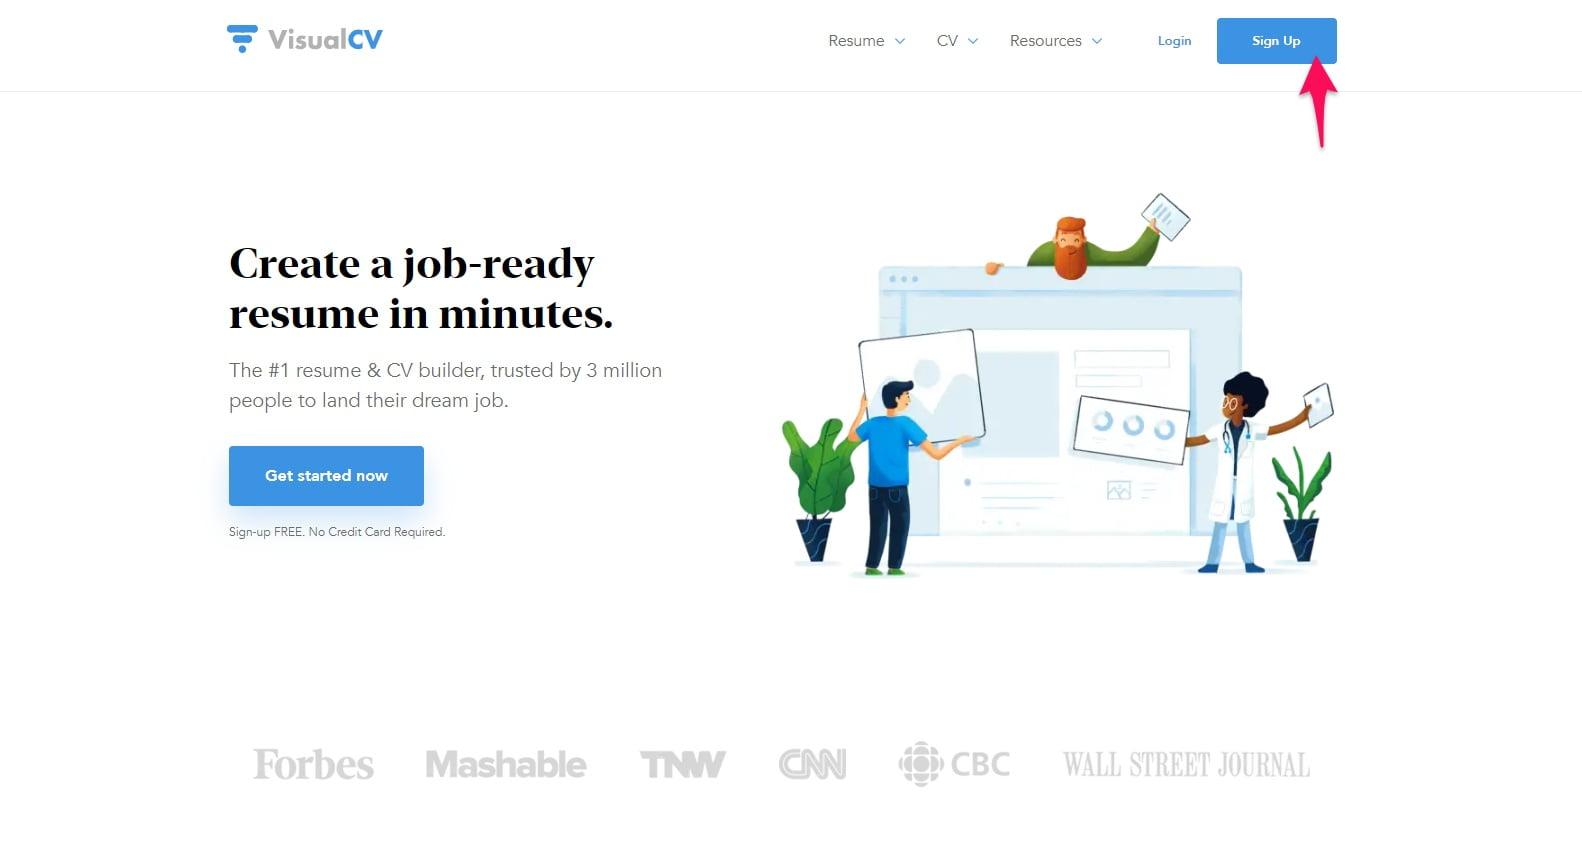 VisualCV sign up